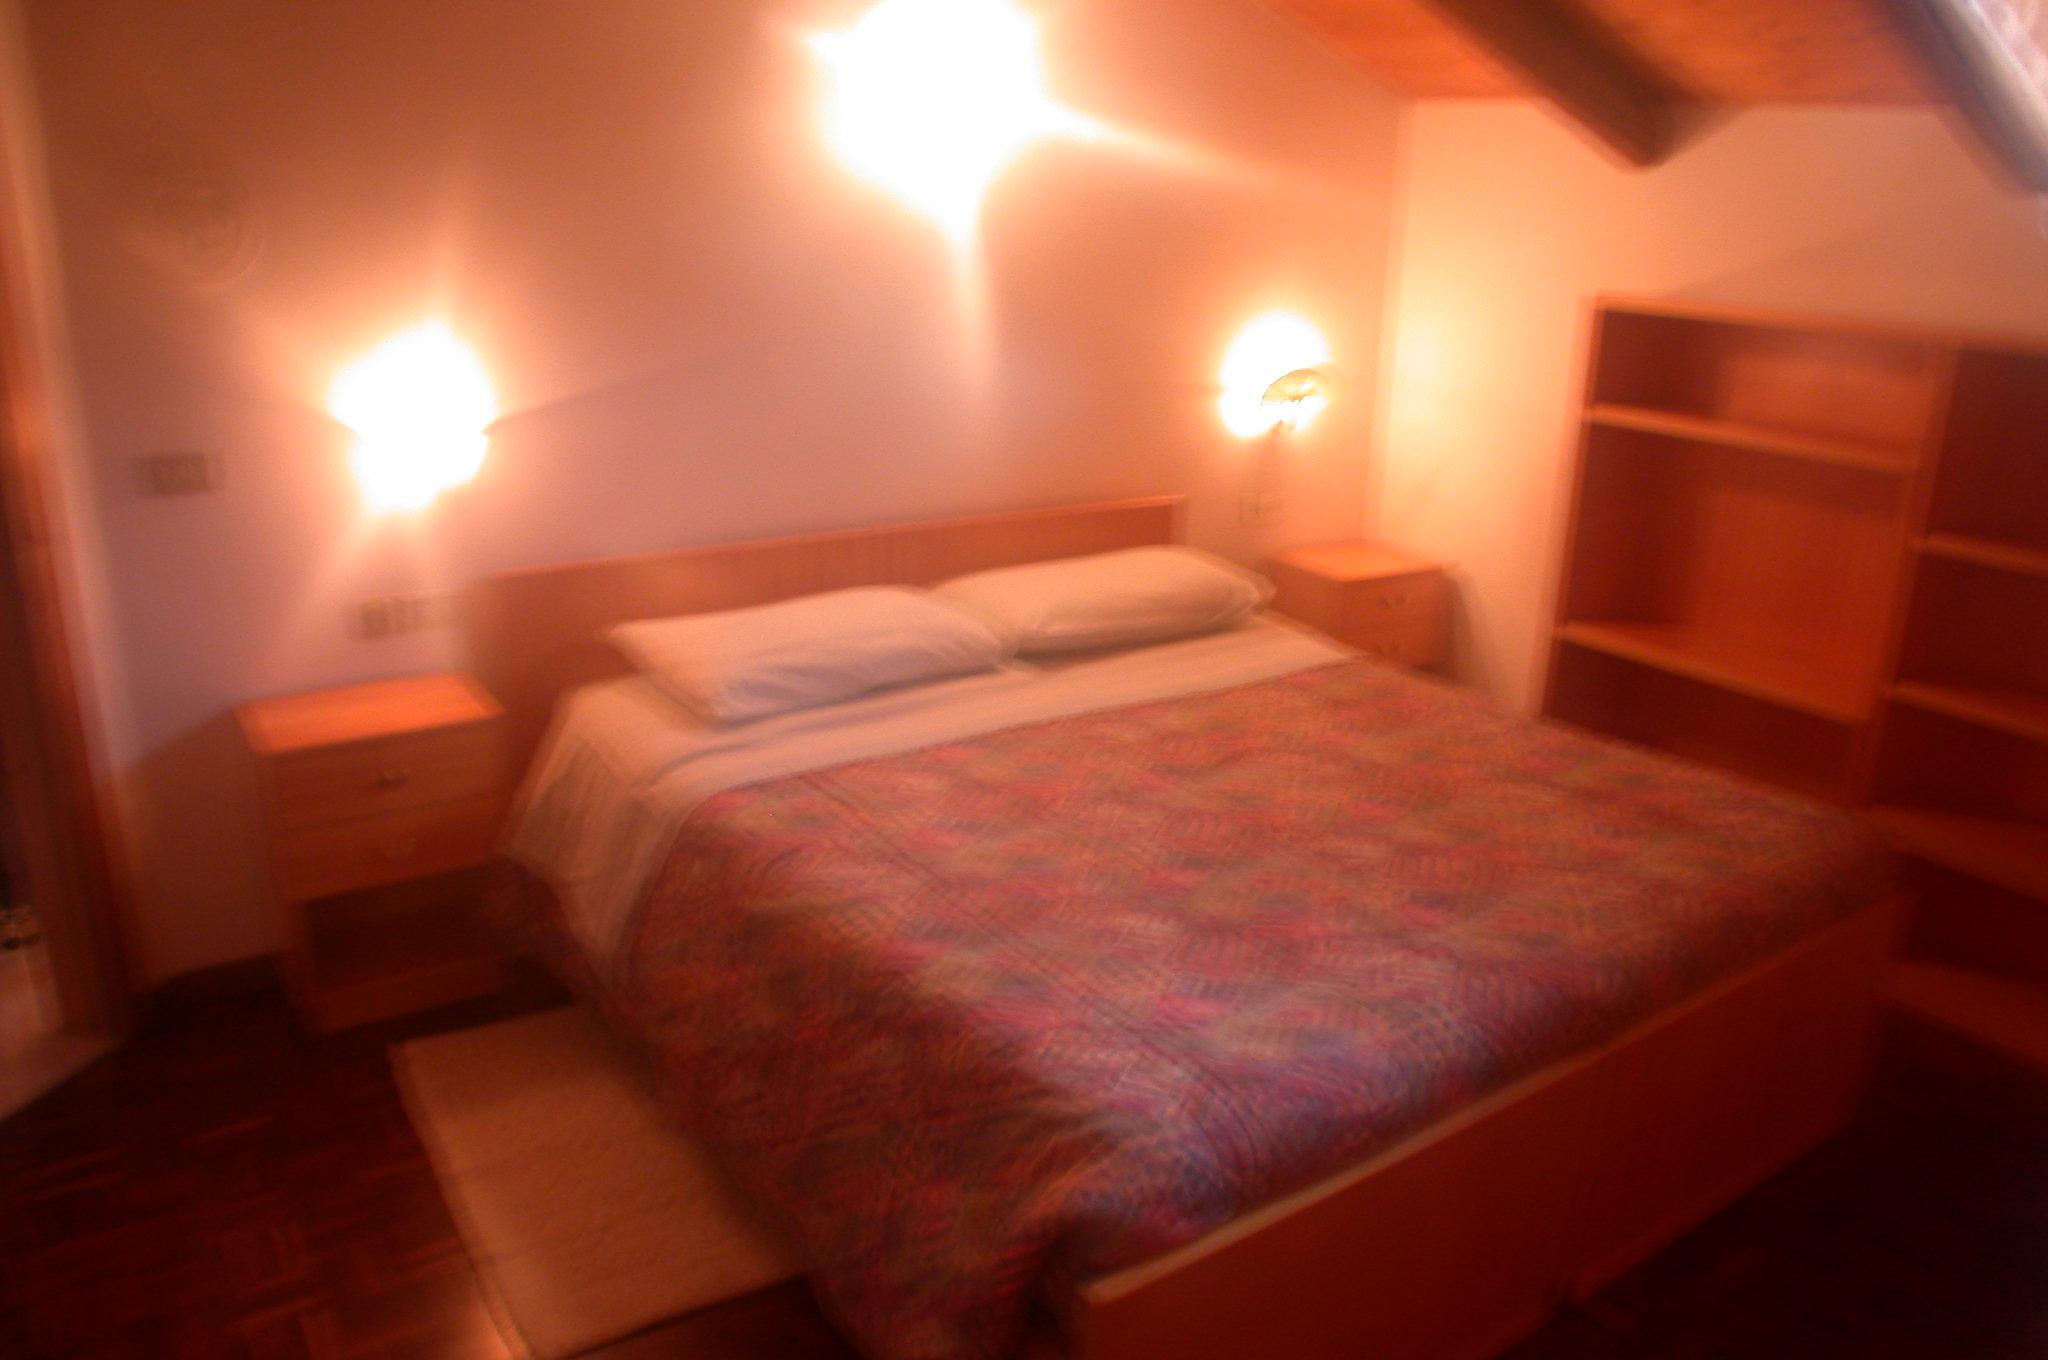 affitto appartamento montagna panchia 916 (20110222230209-2011-69746-NDP.JPG)